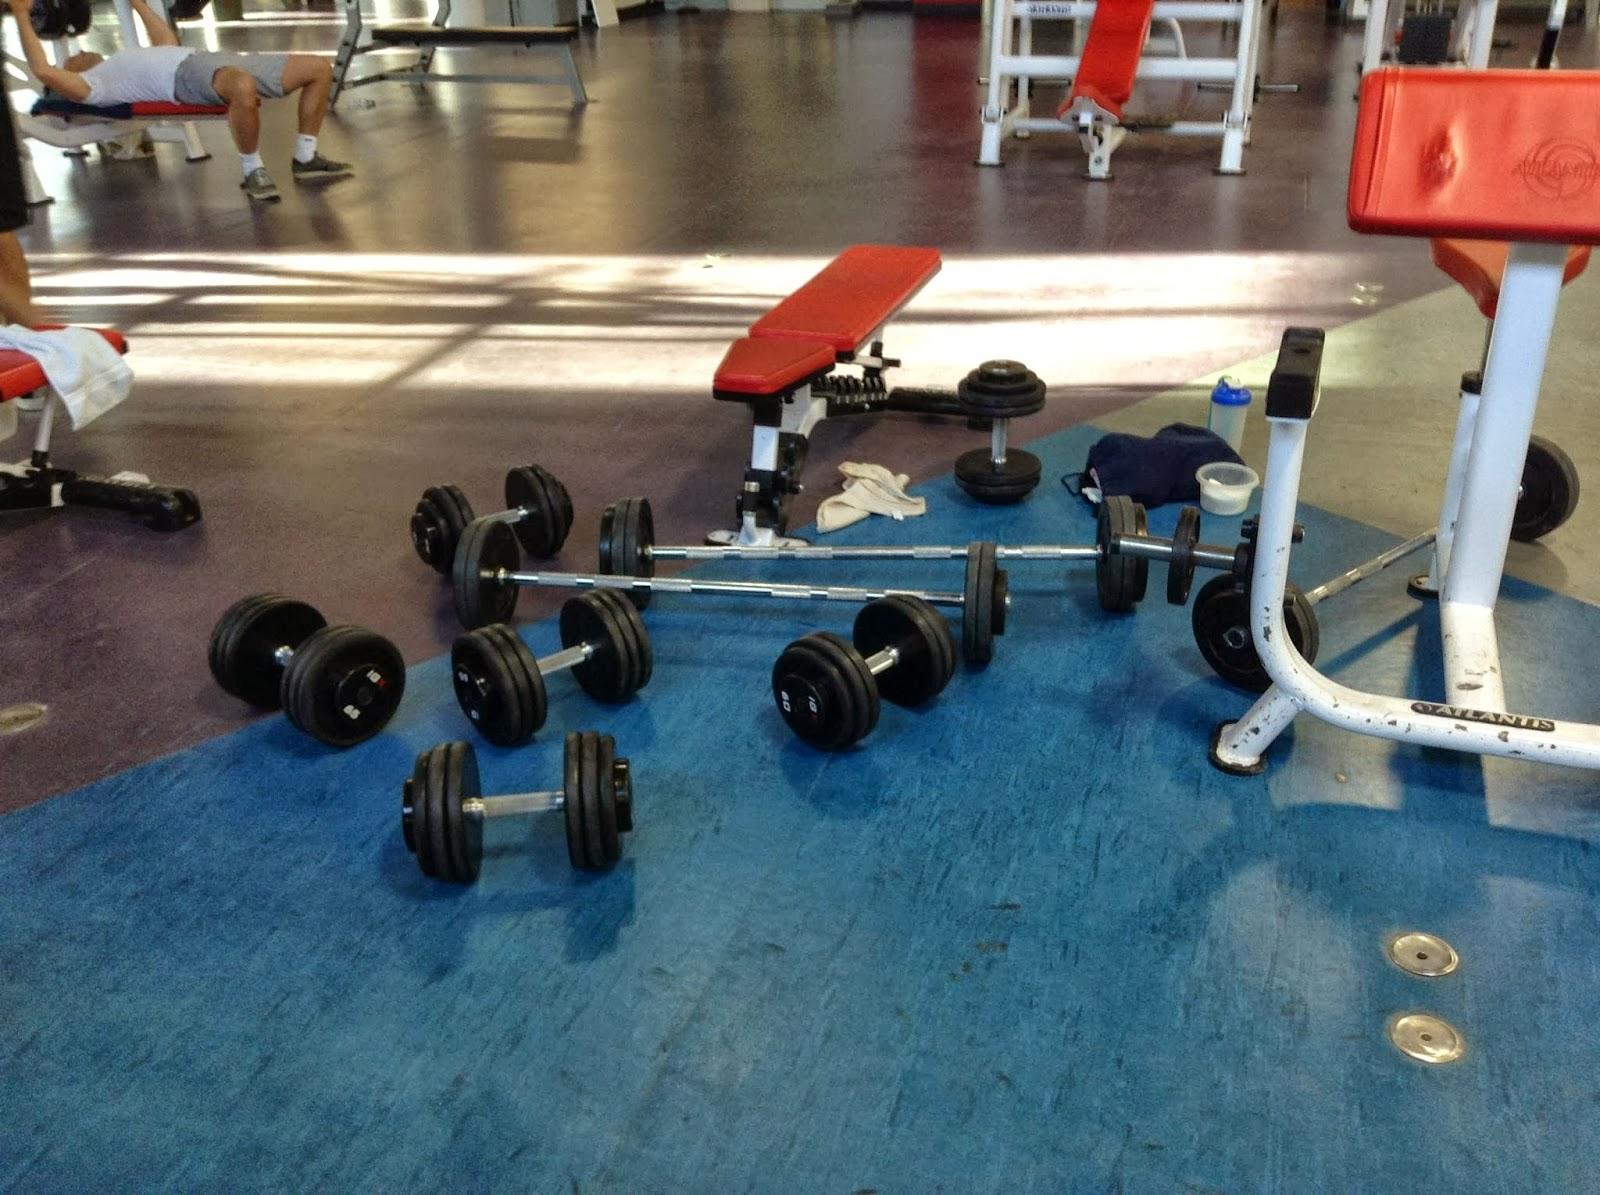 unwritten gym rules